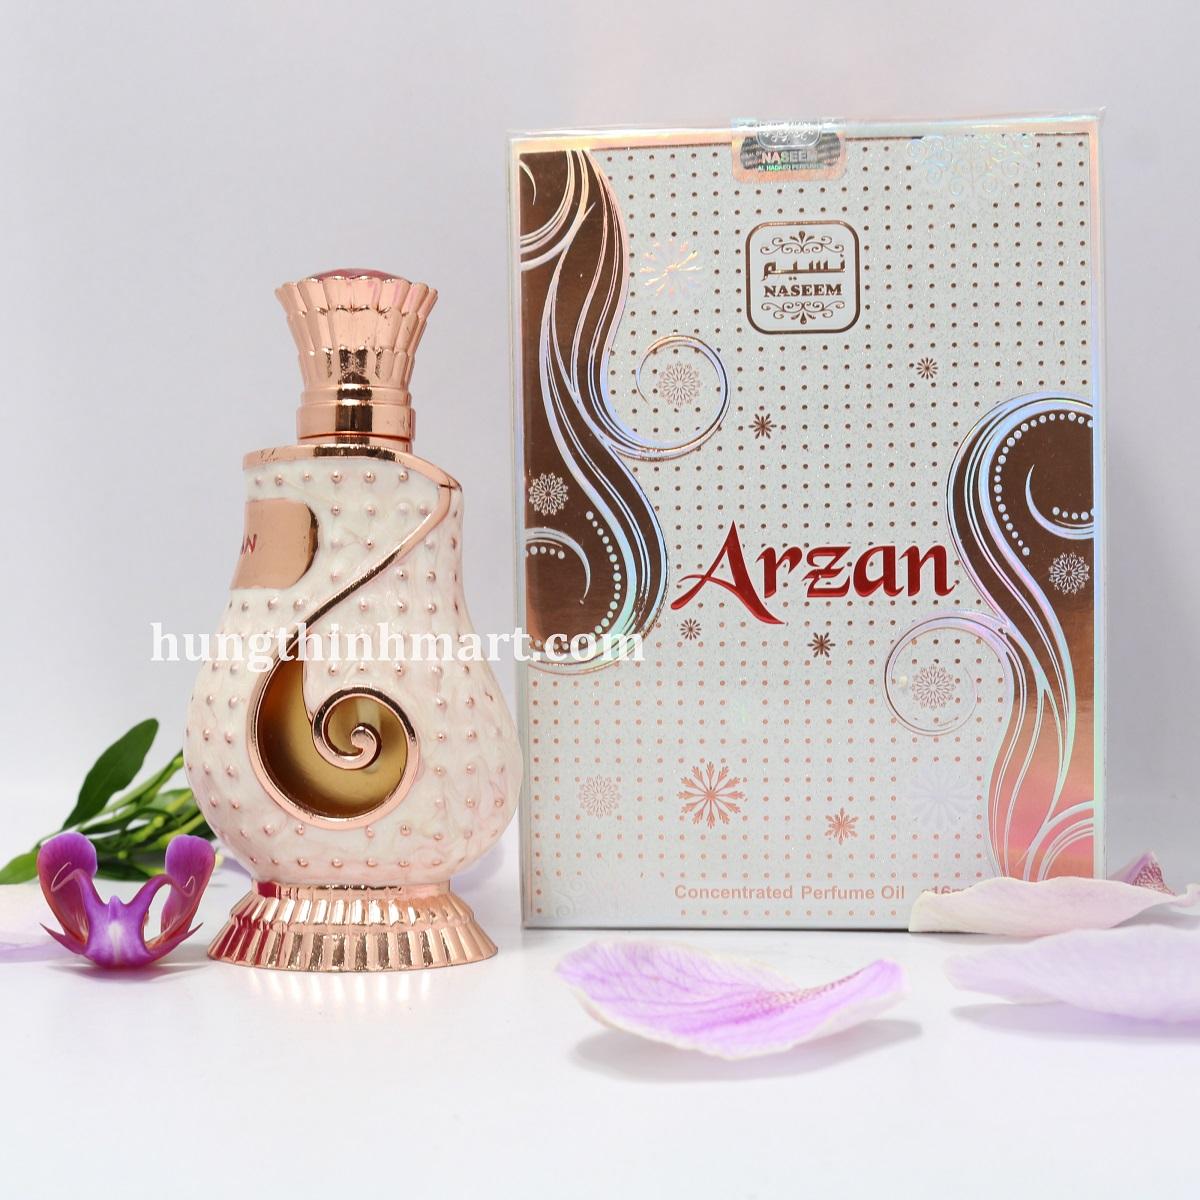 tinh-dầu-dubai-Arzan-2